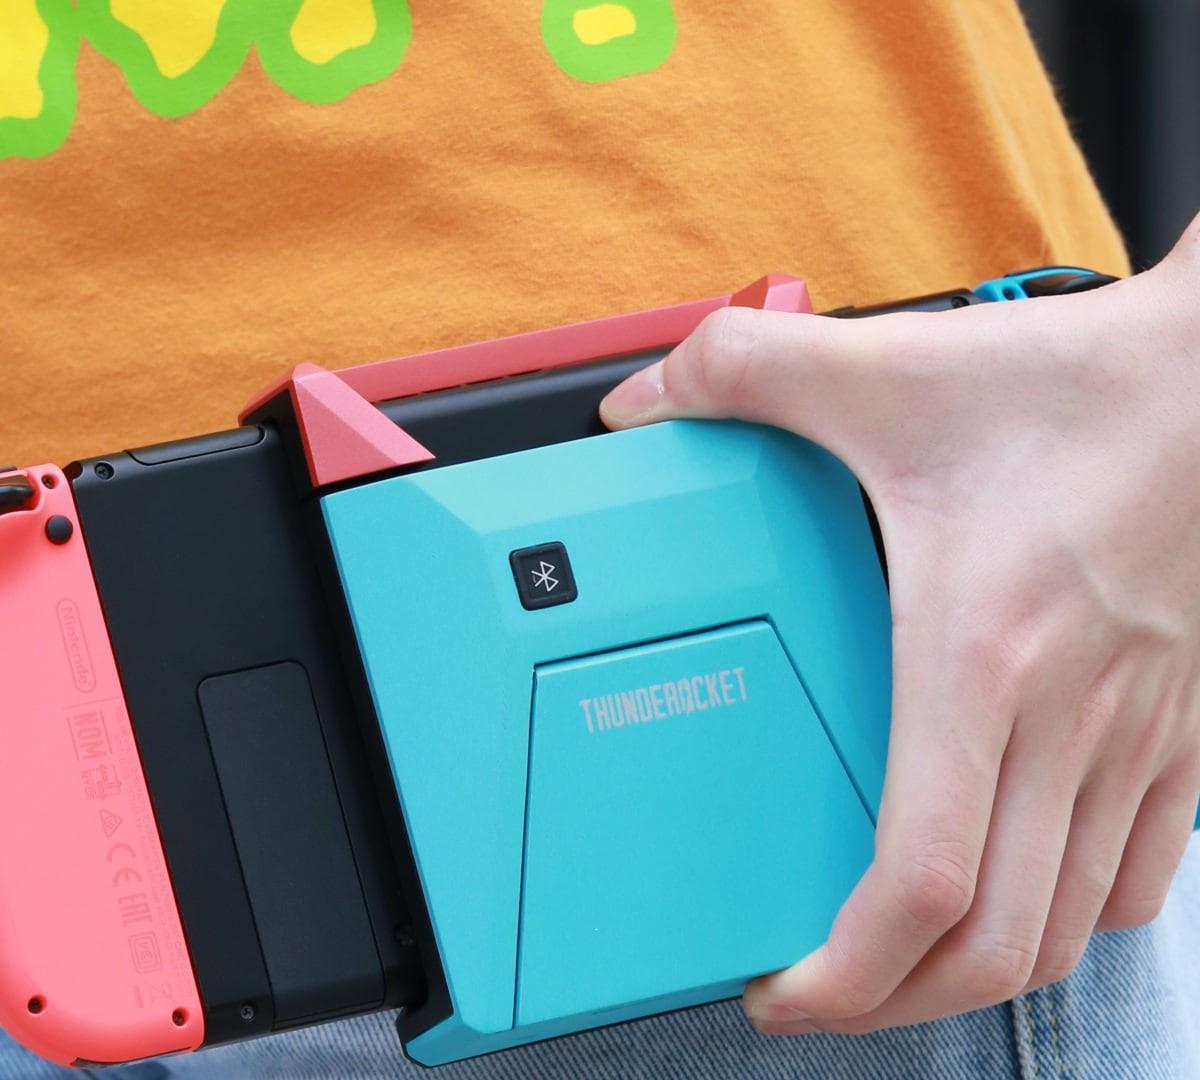 Switchblade Bluetooth Hub for Nintendo Switch has a kickstand and an HDMI output